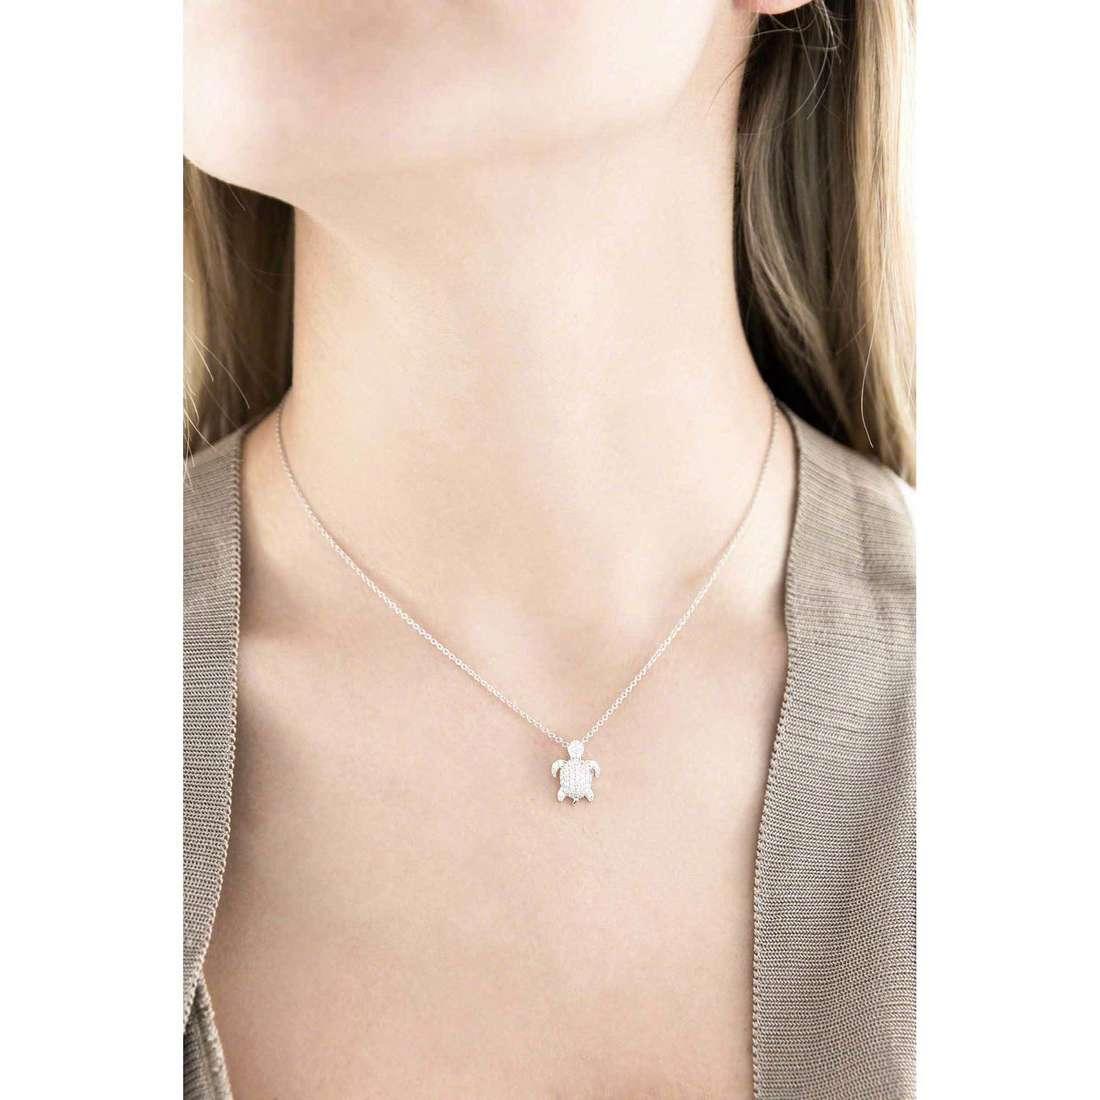 GioiaPura colliers femme 37587-01-00 indosso